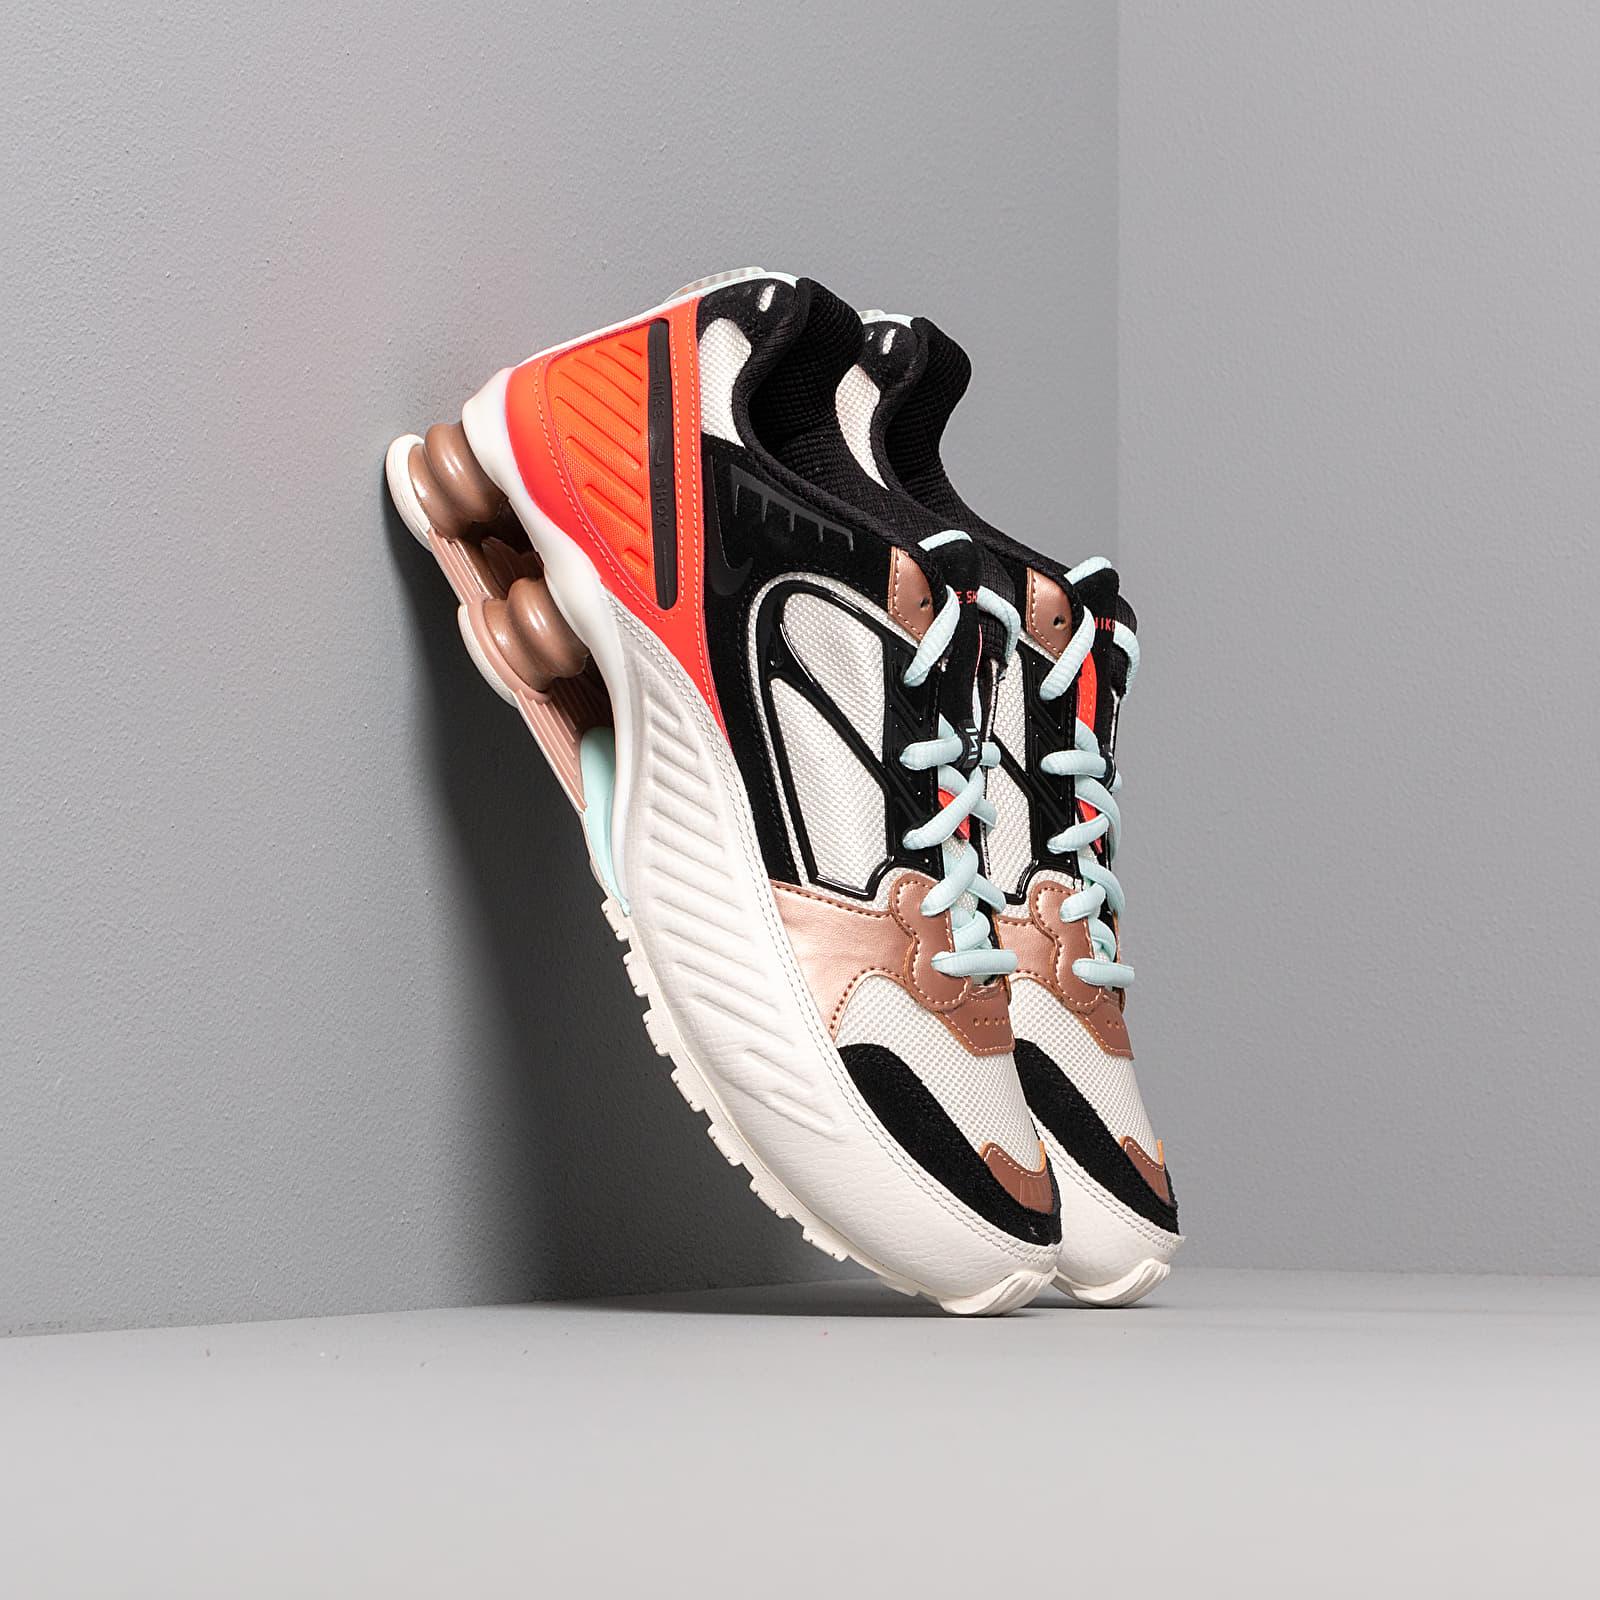 Dámske topánky a tenisky Nike Wmns Shox Enigma Sail/ Black-Mtlc Red Bronze-Pure Platinum